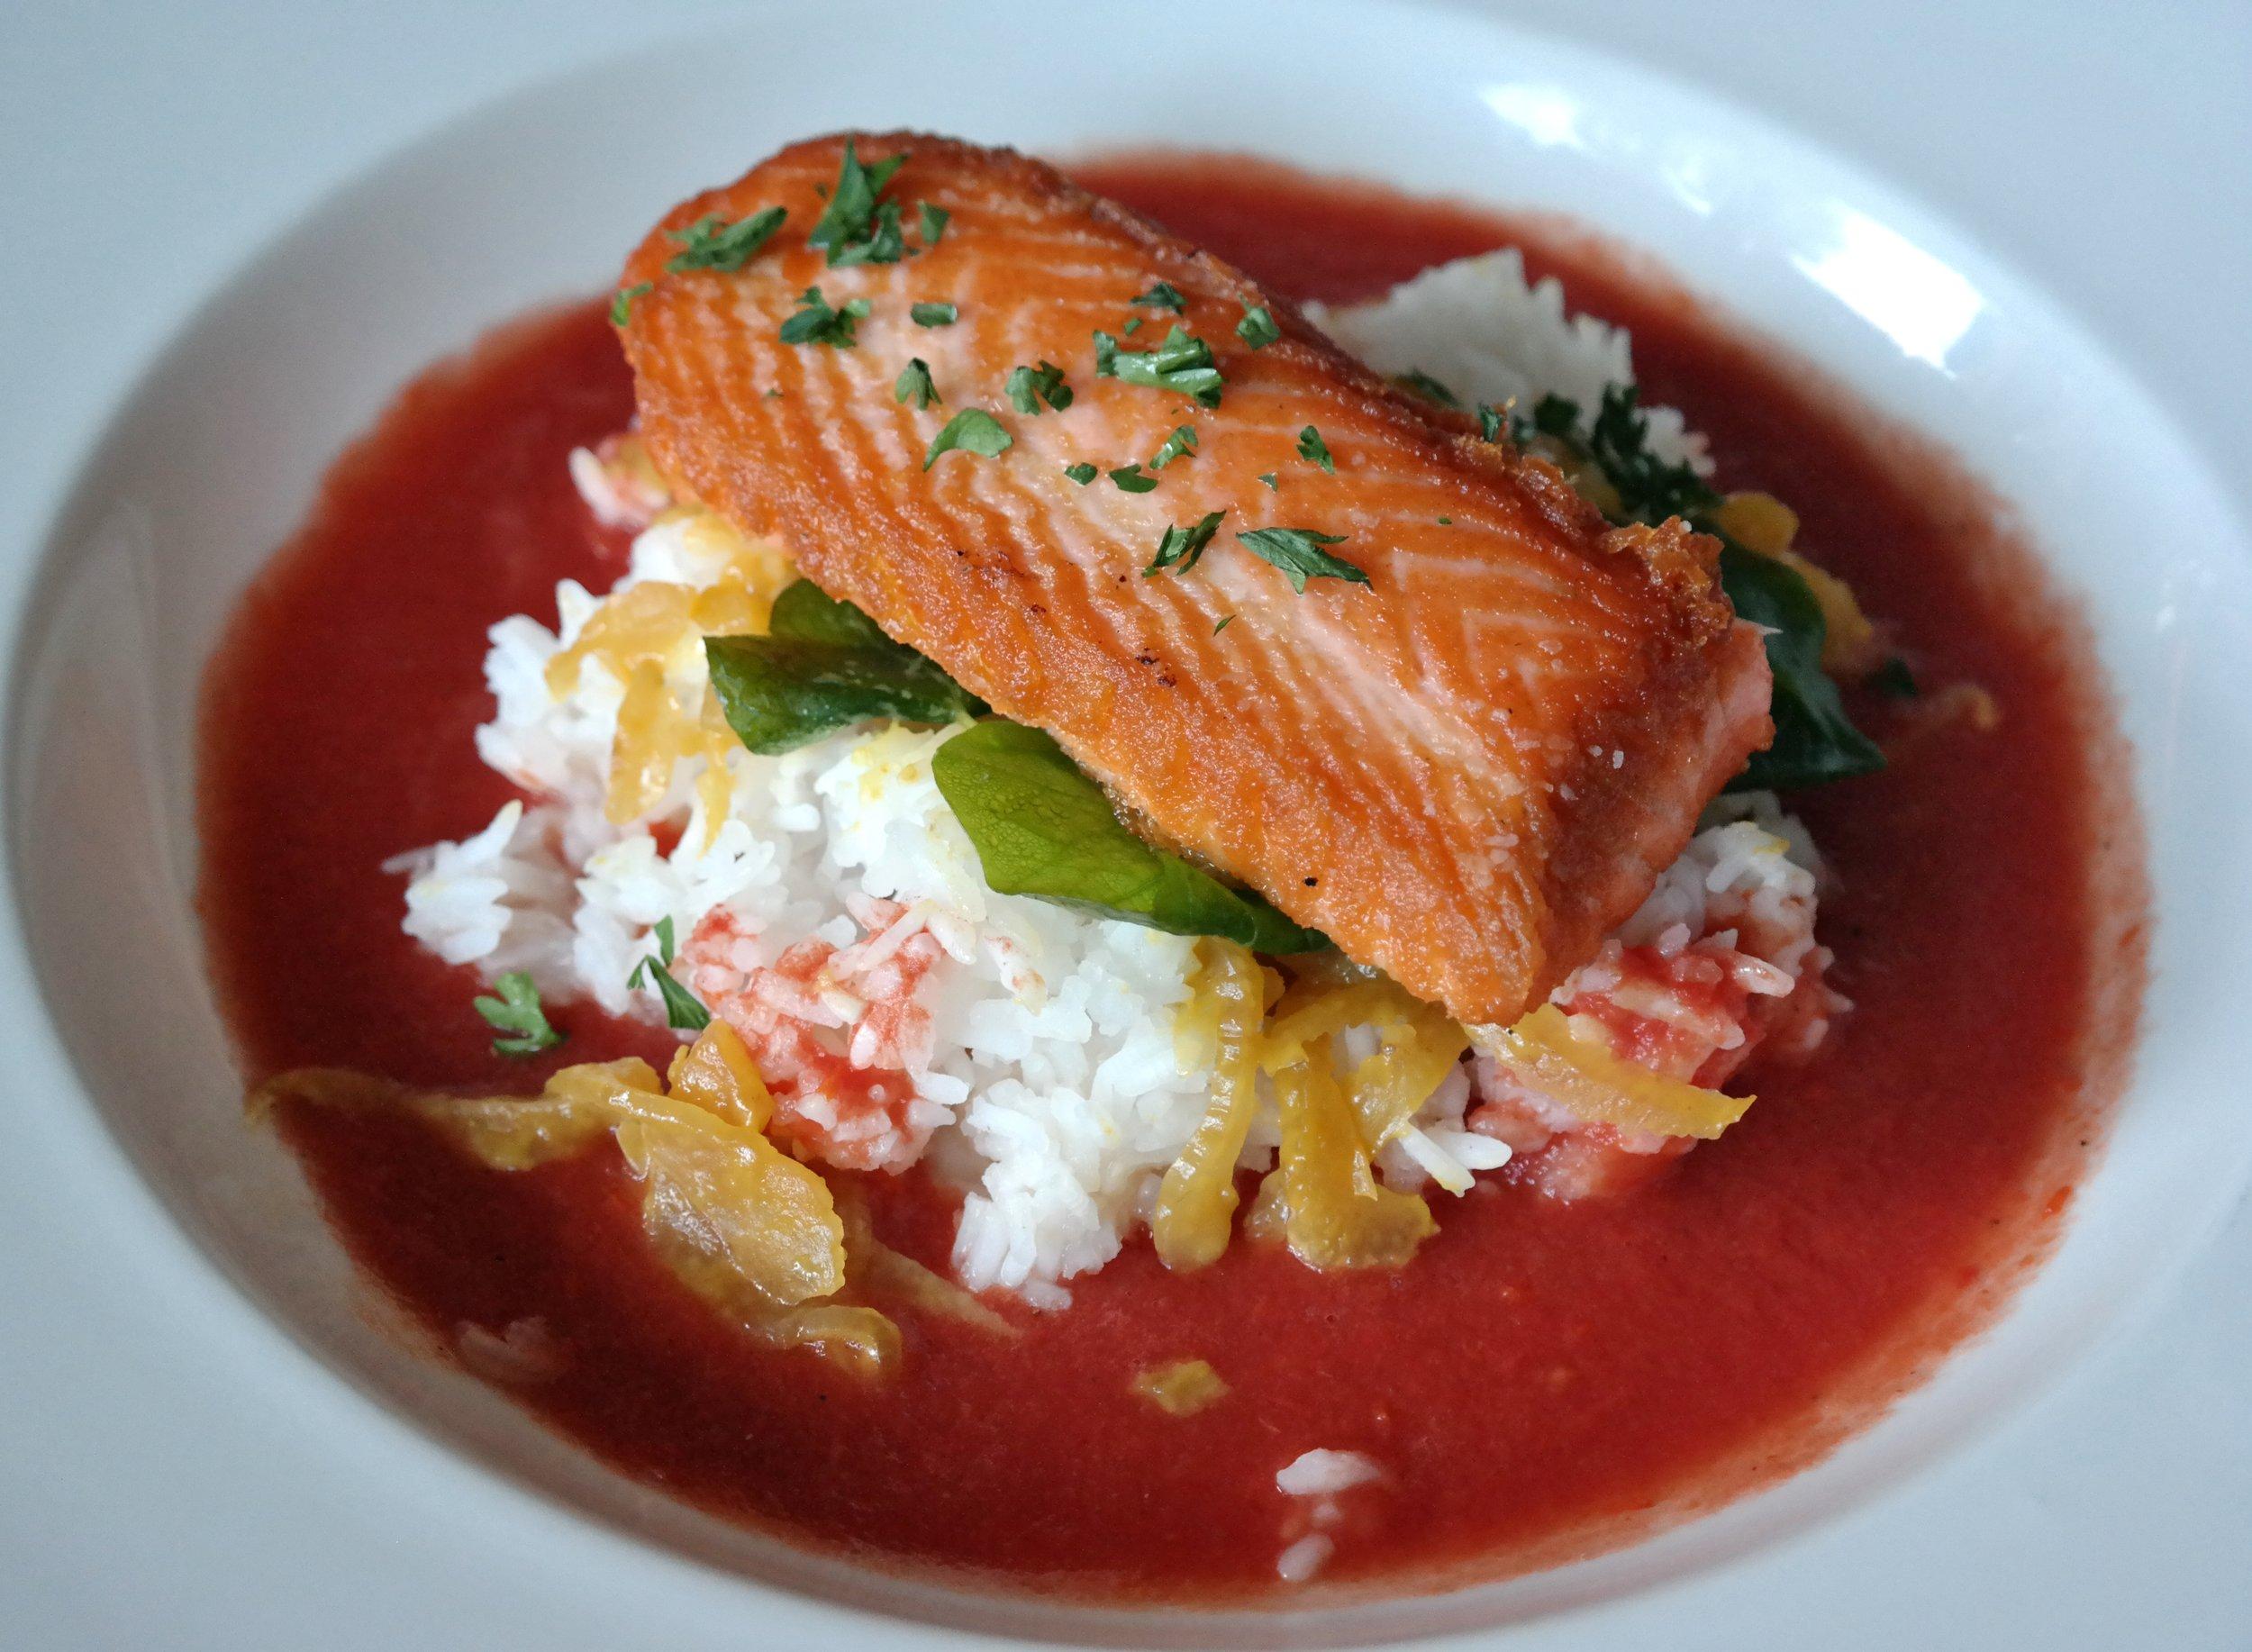 ZuZu: Oro King salmon, jasmine rice, bok choy, shiso, tomato-lemongrass broth